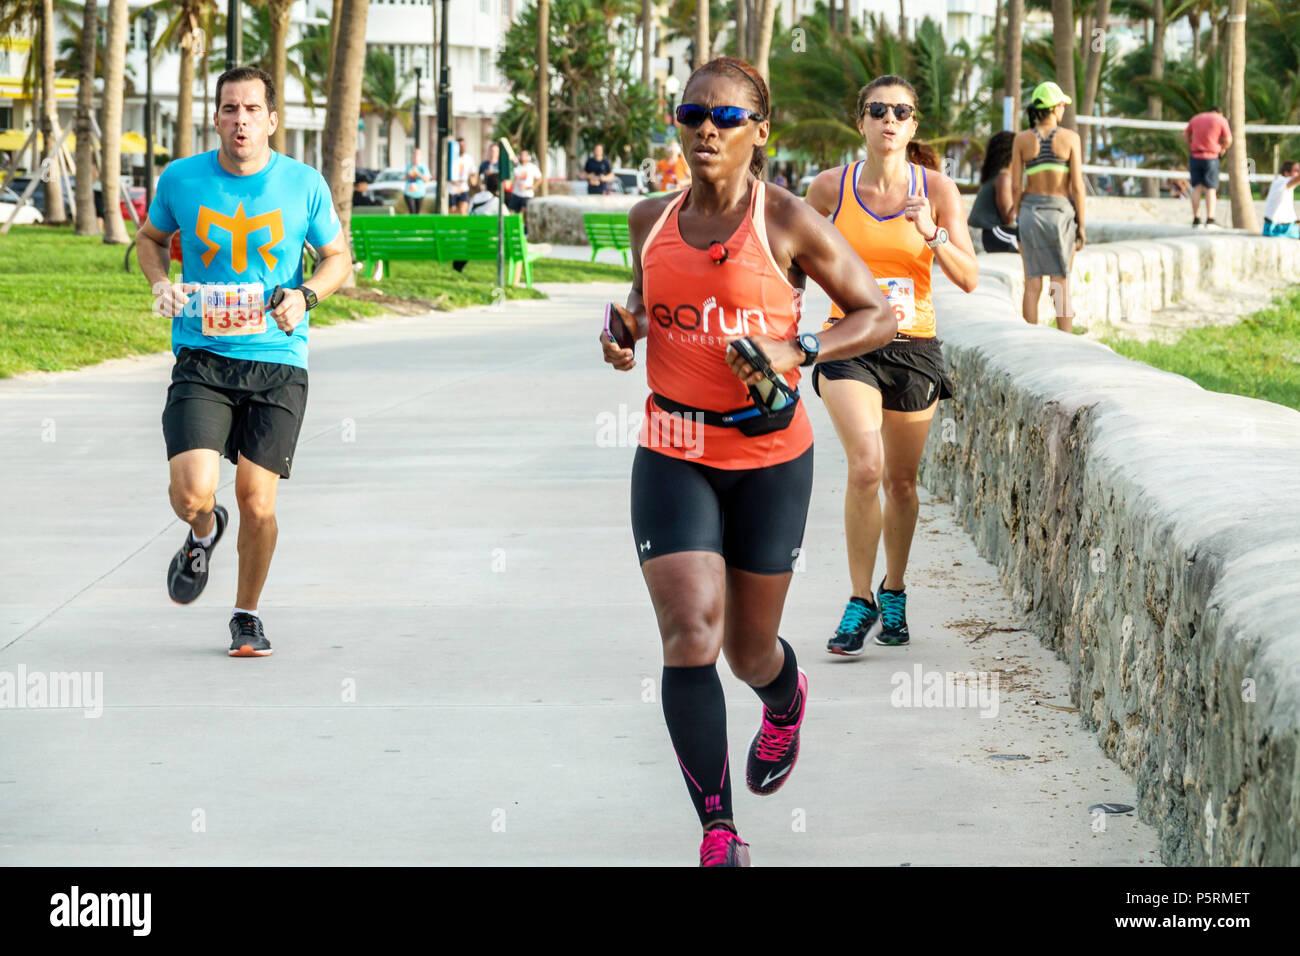 Miami Beach Florida Ocean Drive Lummus Park Burger King 5K Beach Run fundraiser corporate sponsor Black woman man runners running race sport competiti - Stock Image